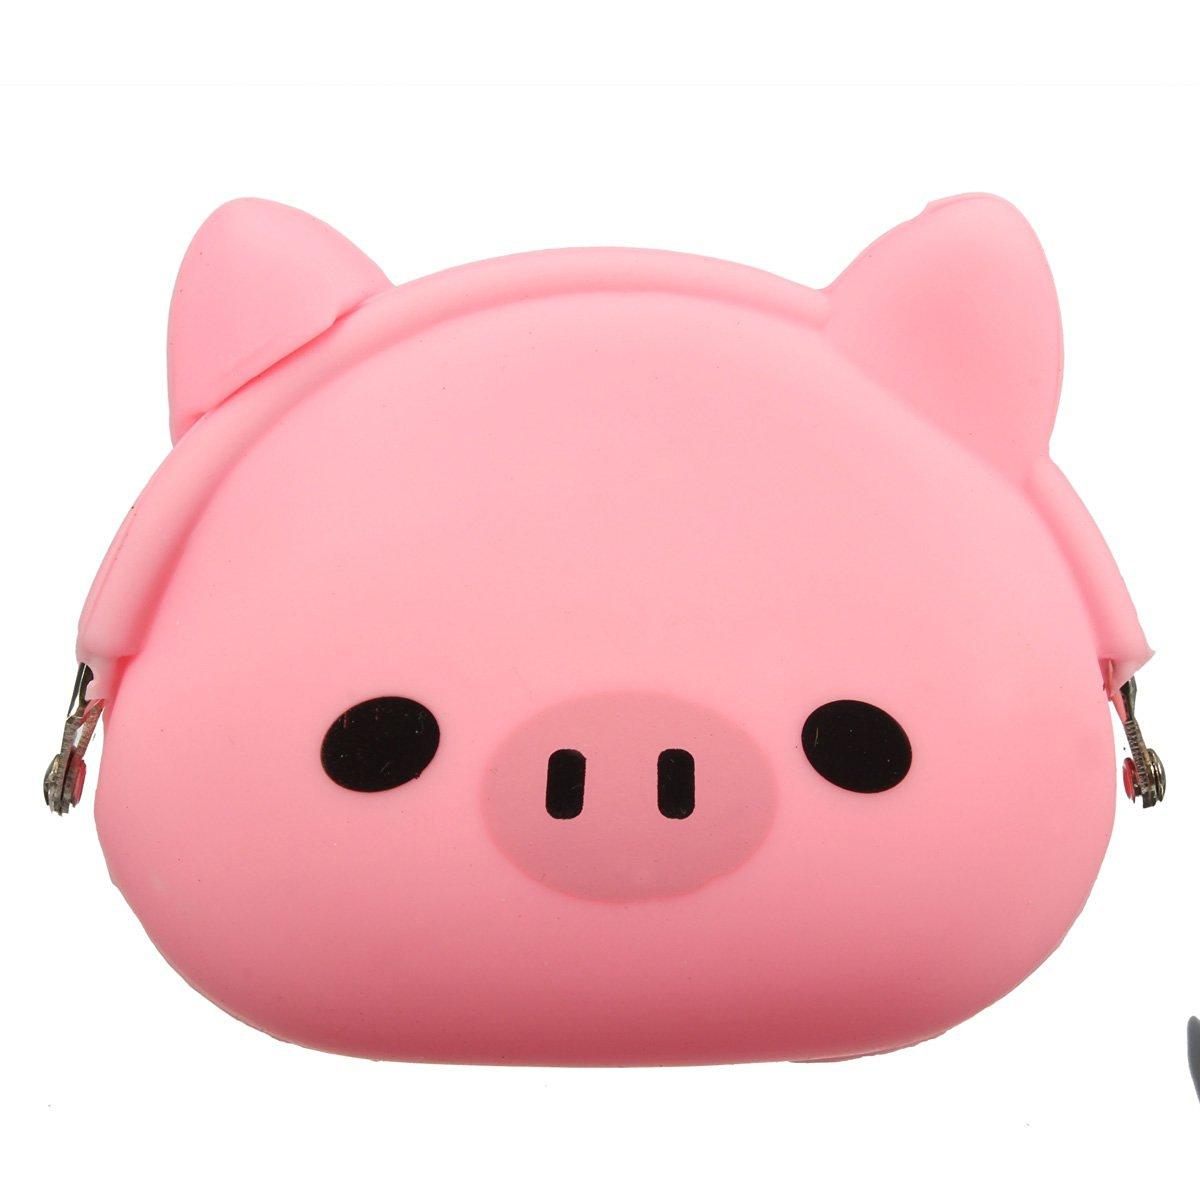 -Women Girls Wallet Kawaii Cute Cartoon Animal Silicone Jelly Coin Bag Purse Kids Gift Pink Pig asds women girls wallet kawaii cute cartoon animal silicone jelly coin bag purse kids gift huskies